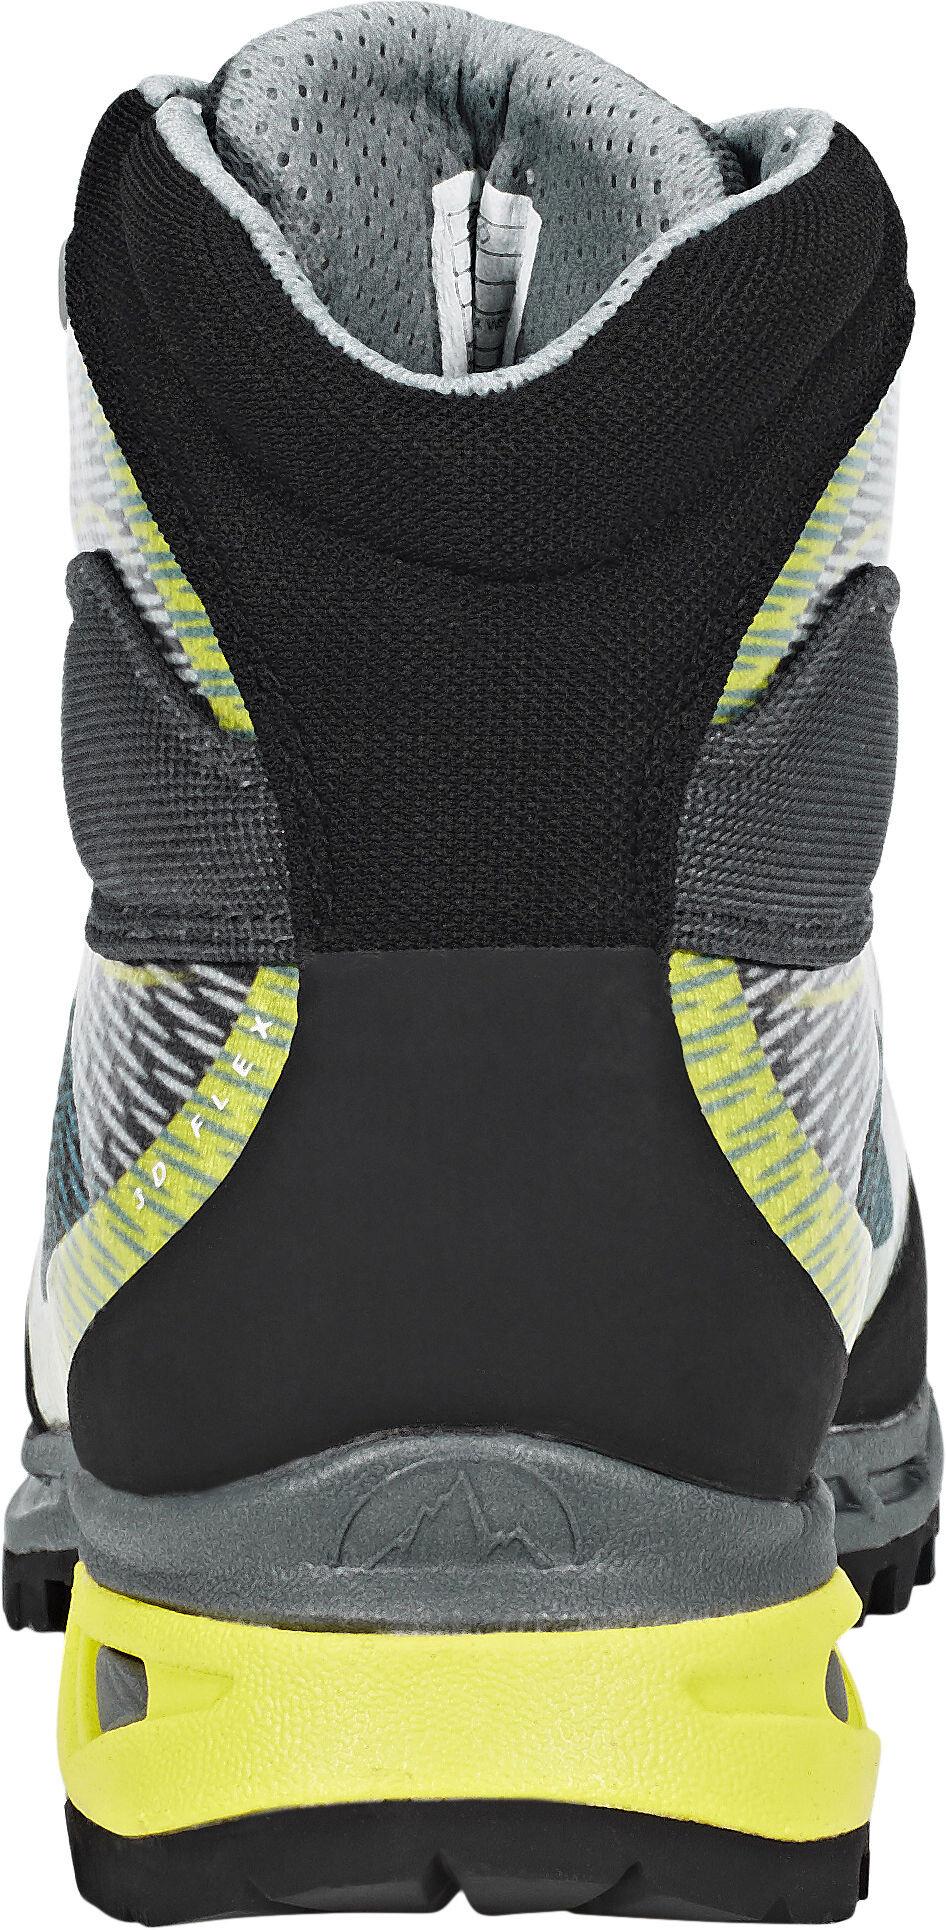 b4793895ebc La Sportiva Trango TRK GTX Shoes Women green bay